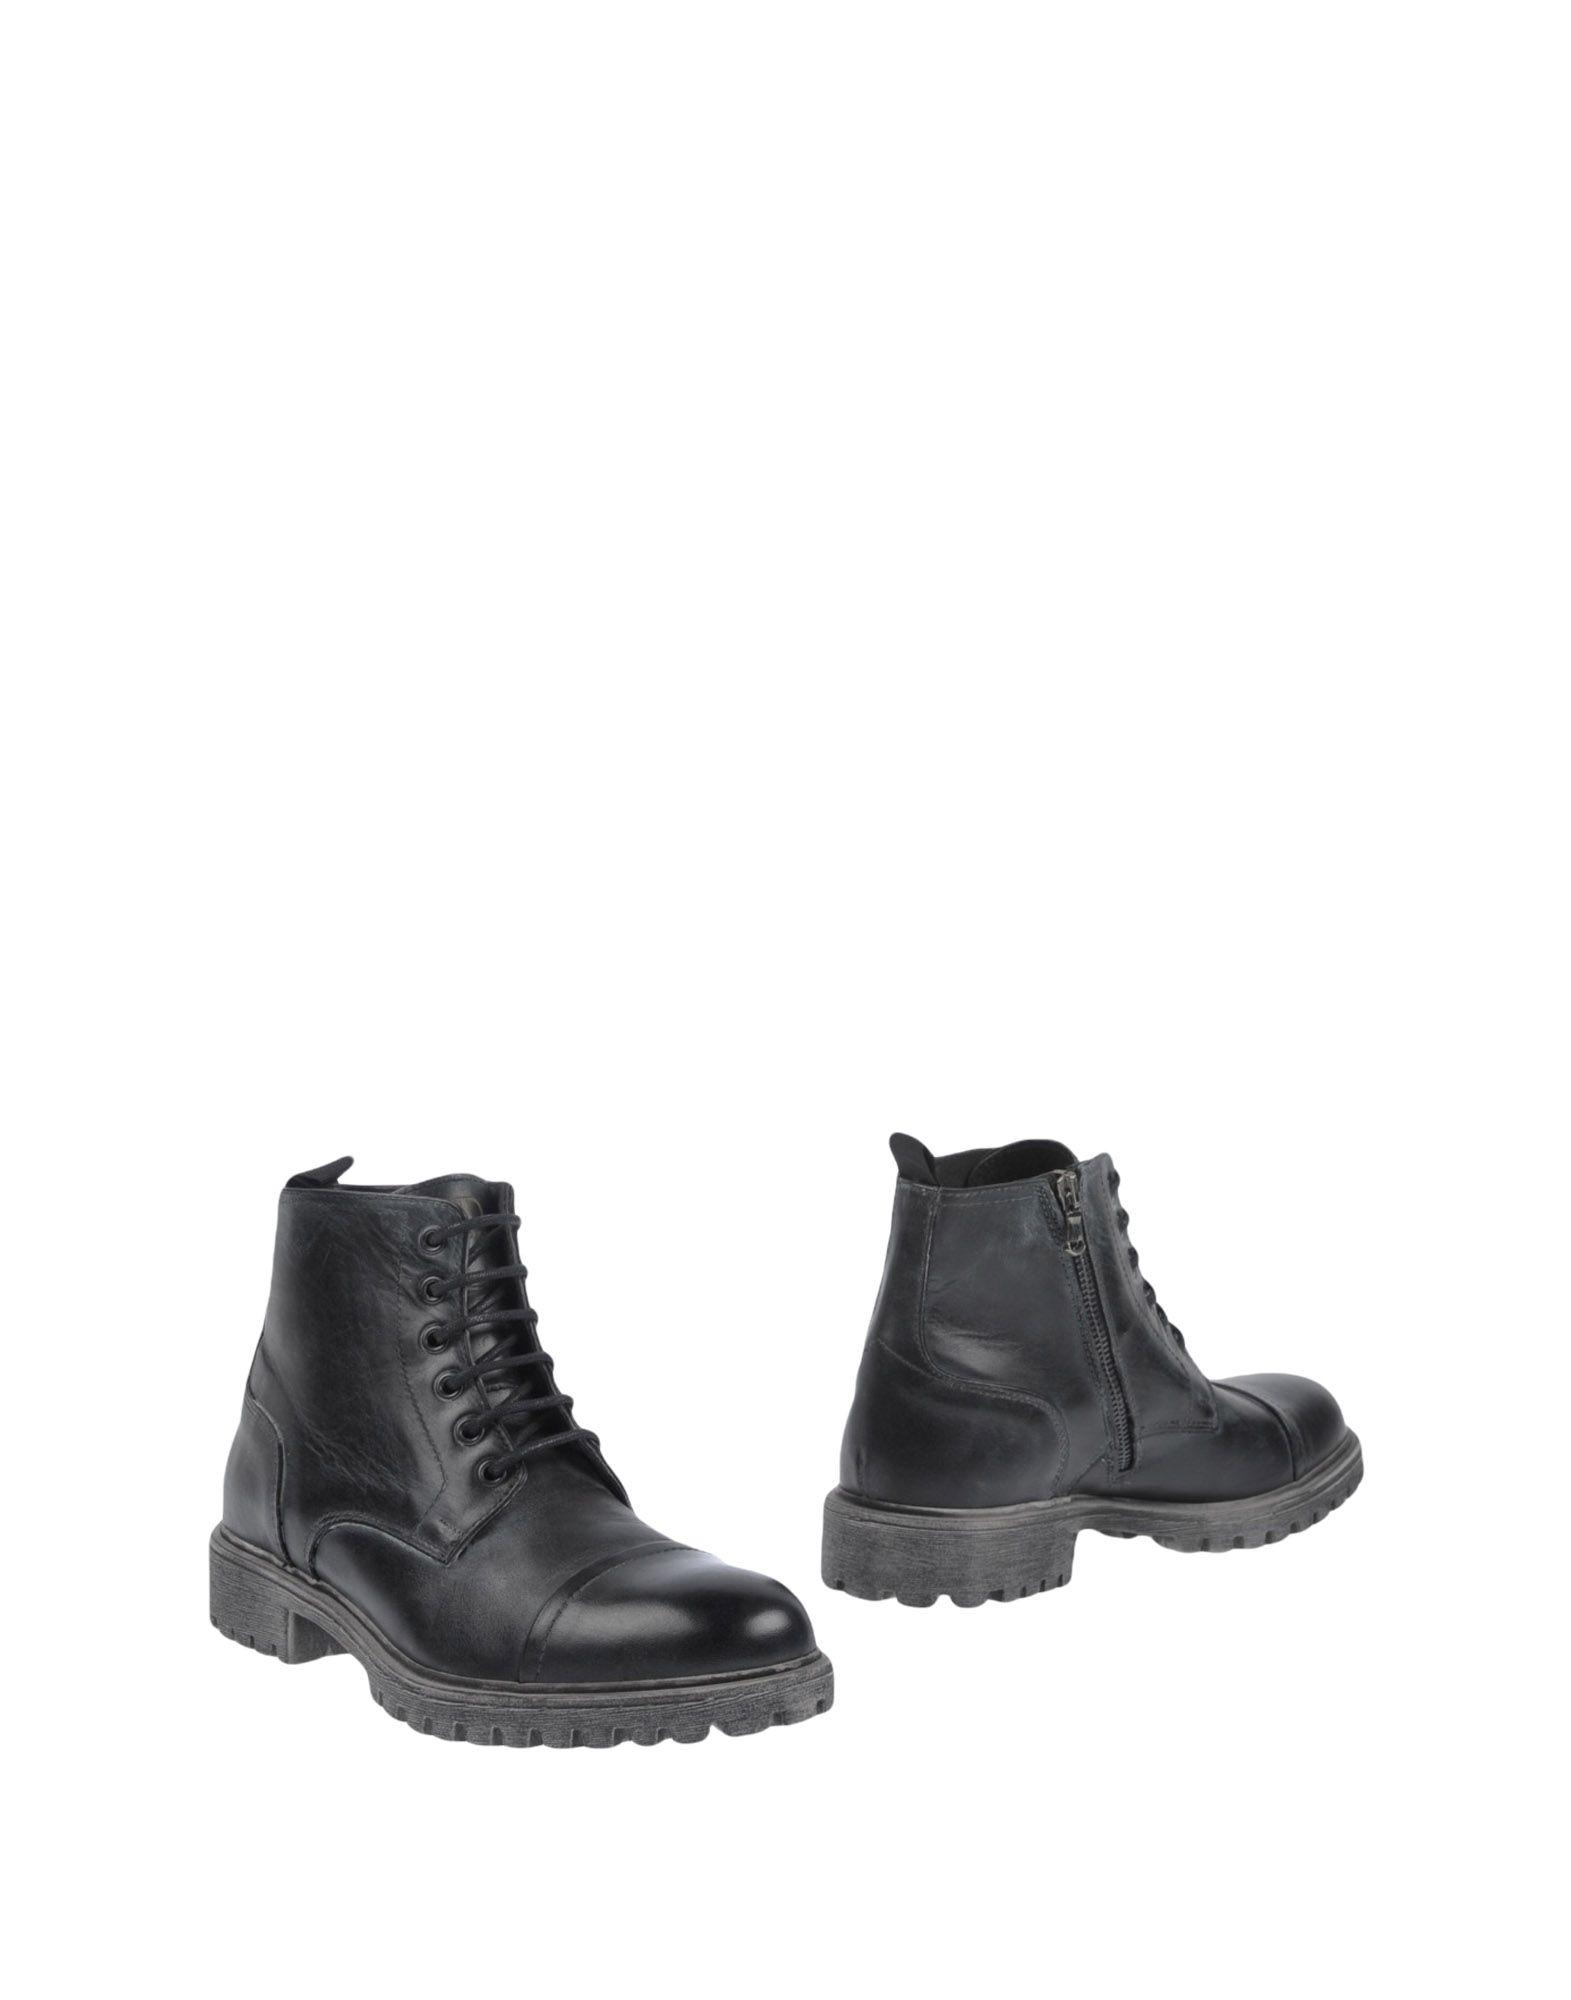 Rabatt echte Schuhe Eredi Del Duca Stiefelette Herren  11451806XP